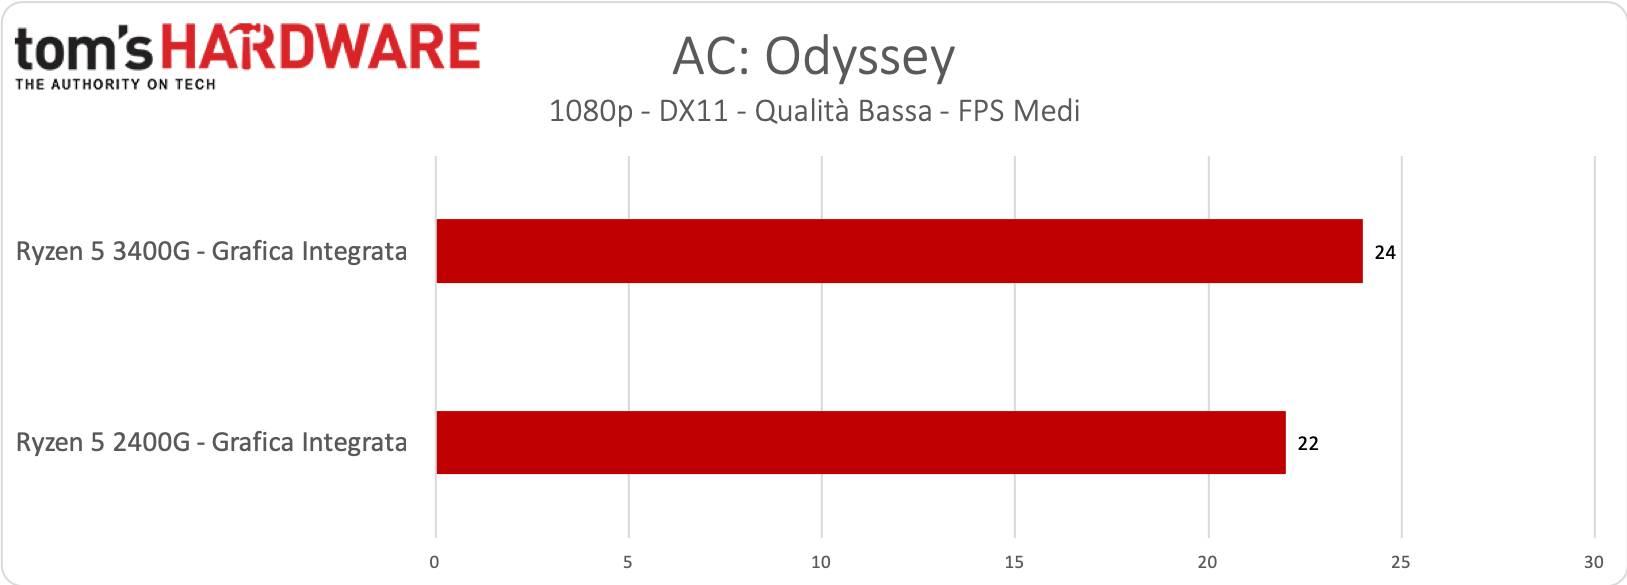 Ryzen 5 3400 - Grafica Integrata - AC: Odyssey